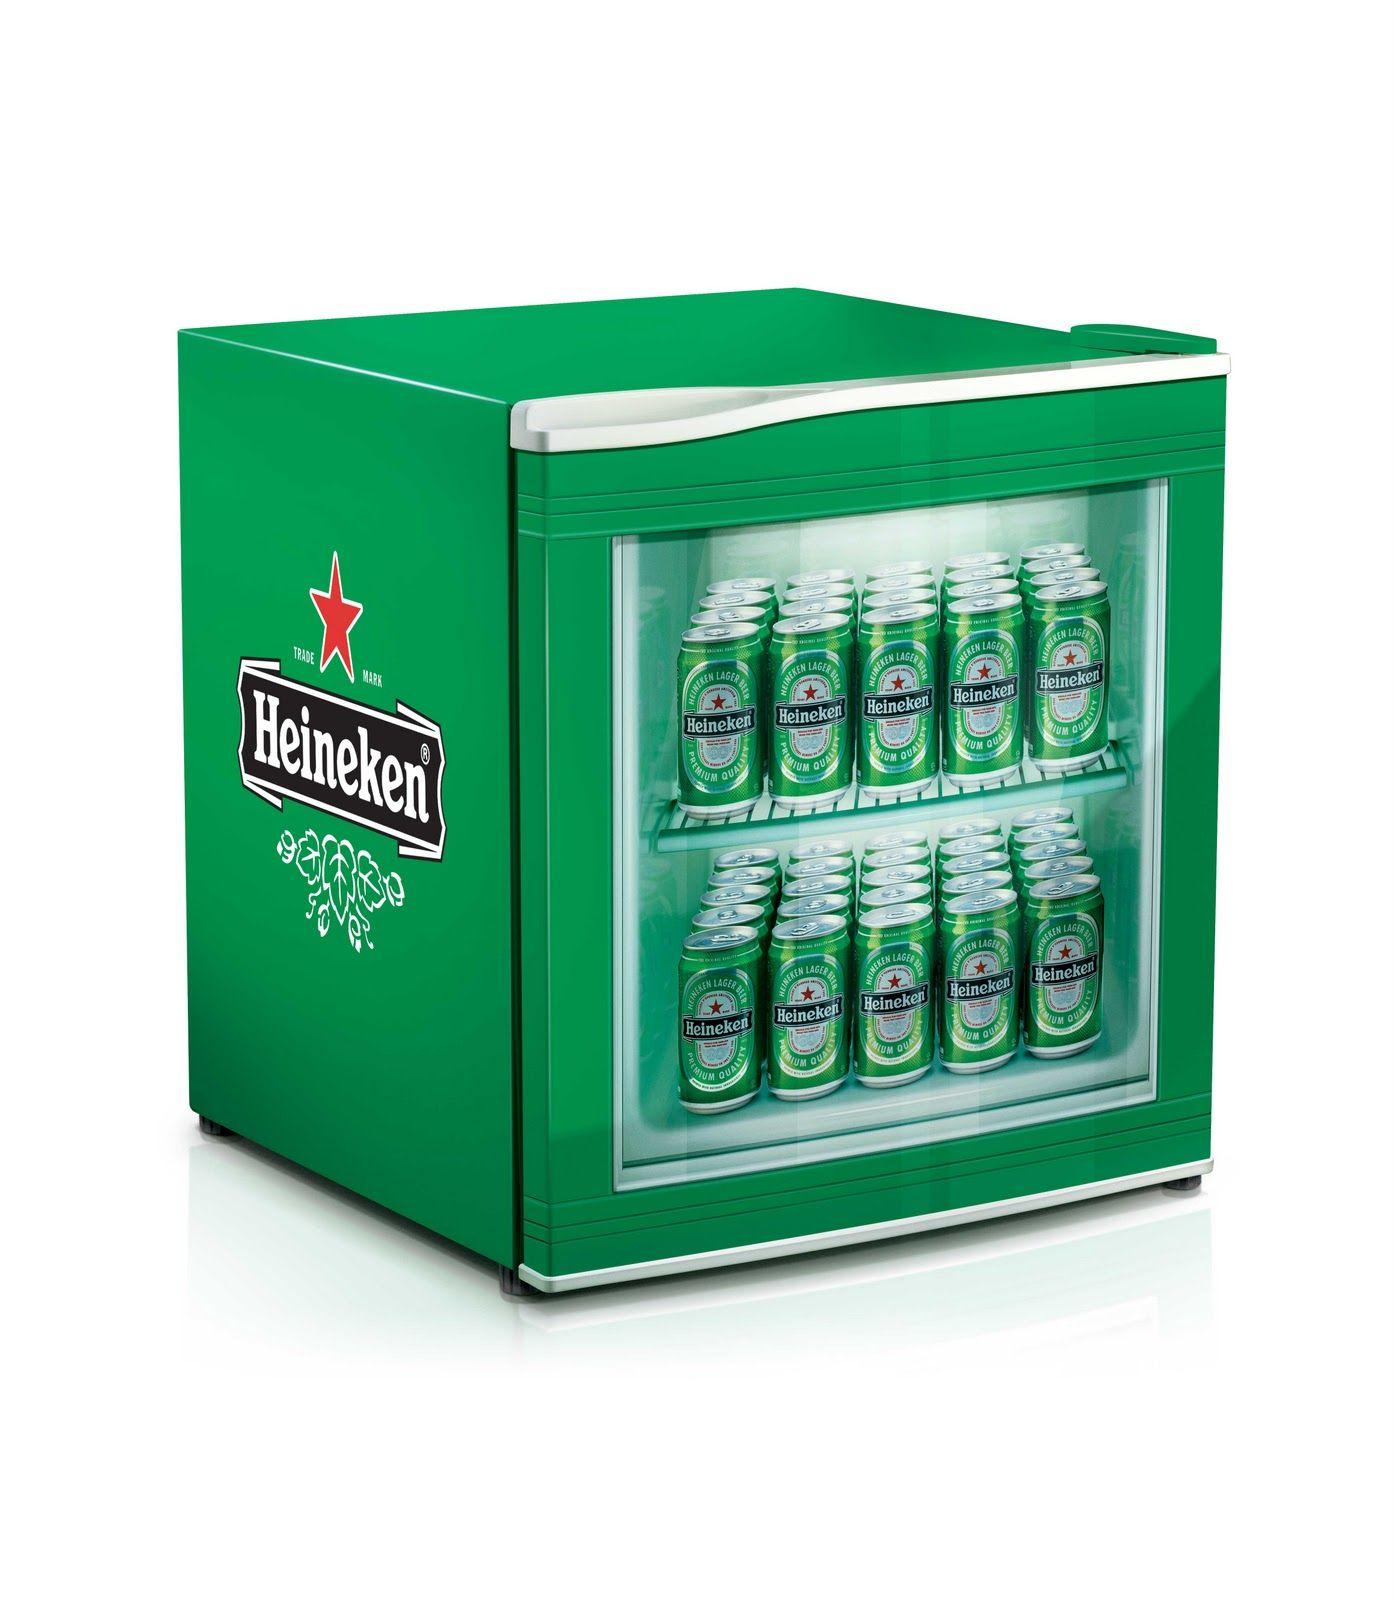 Heineken mini fridge, complete with sticker wrap to mock up full ...